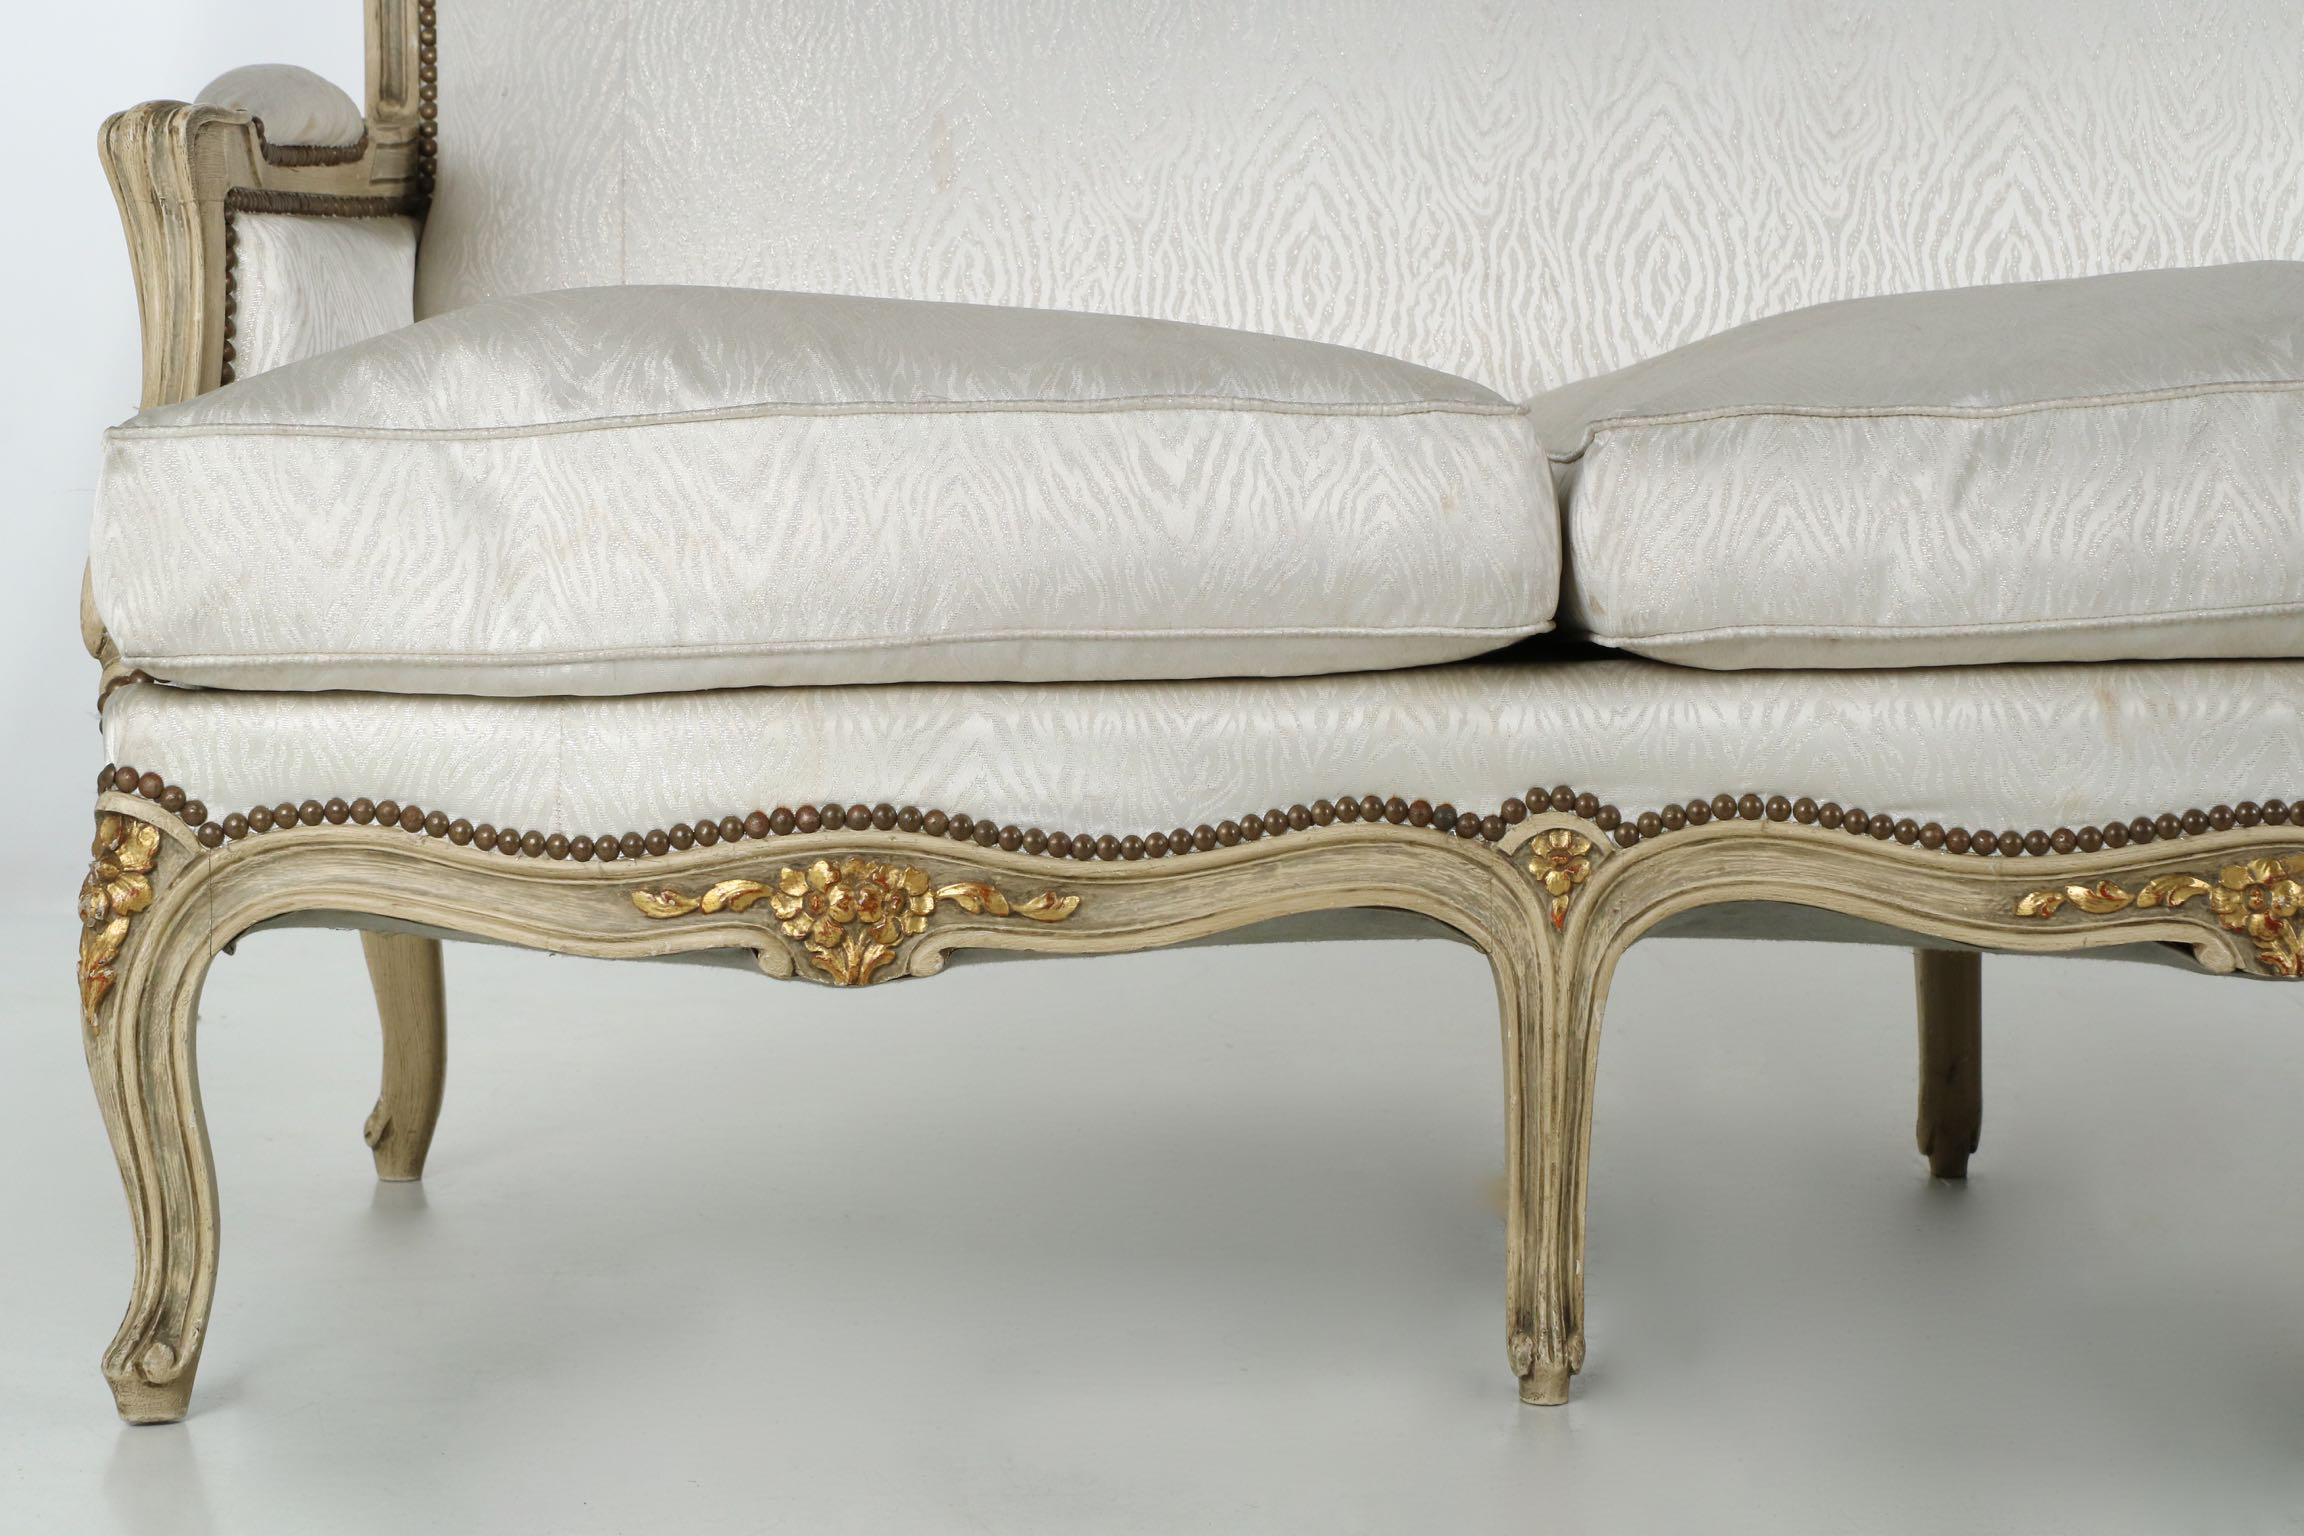 Beau Vintage French Louis XV Style Settee Sofa, Circa 1940u0027s   Image 8 Of 10